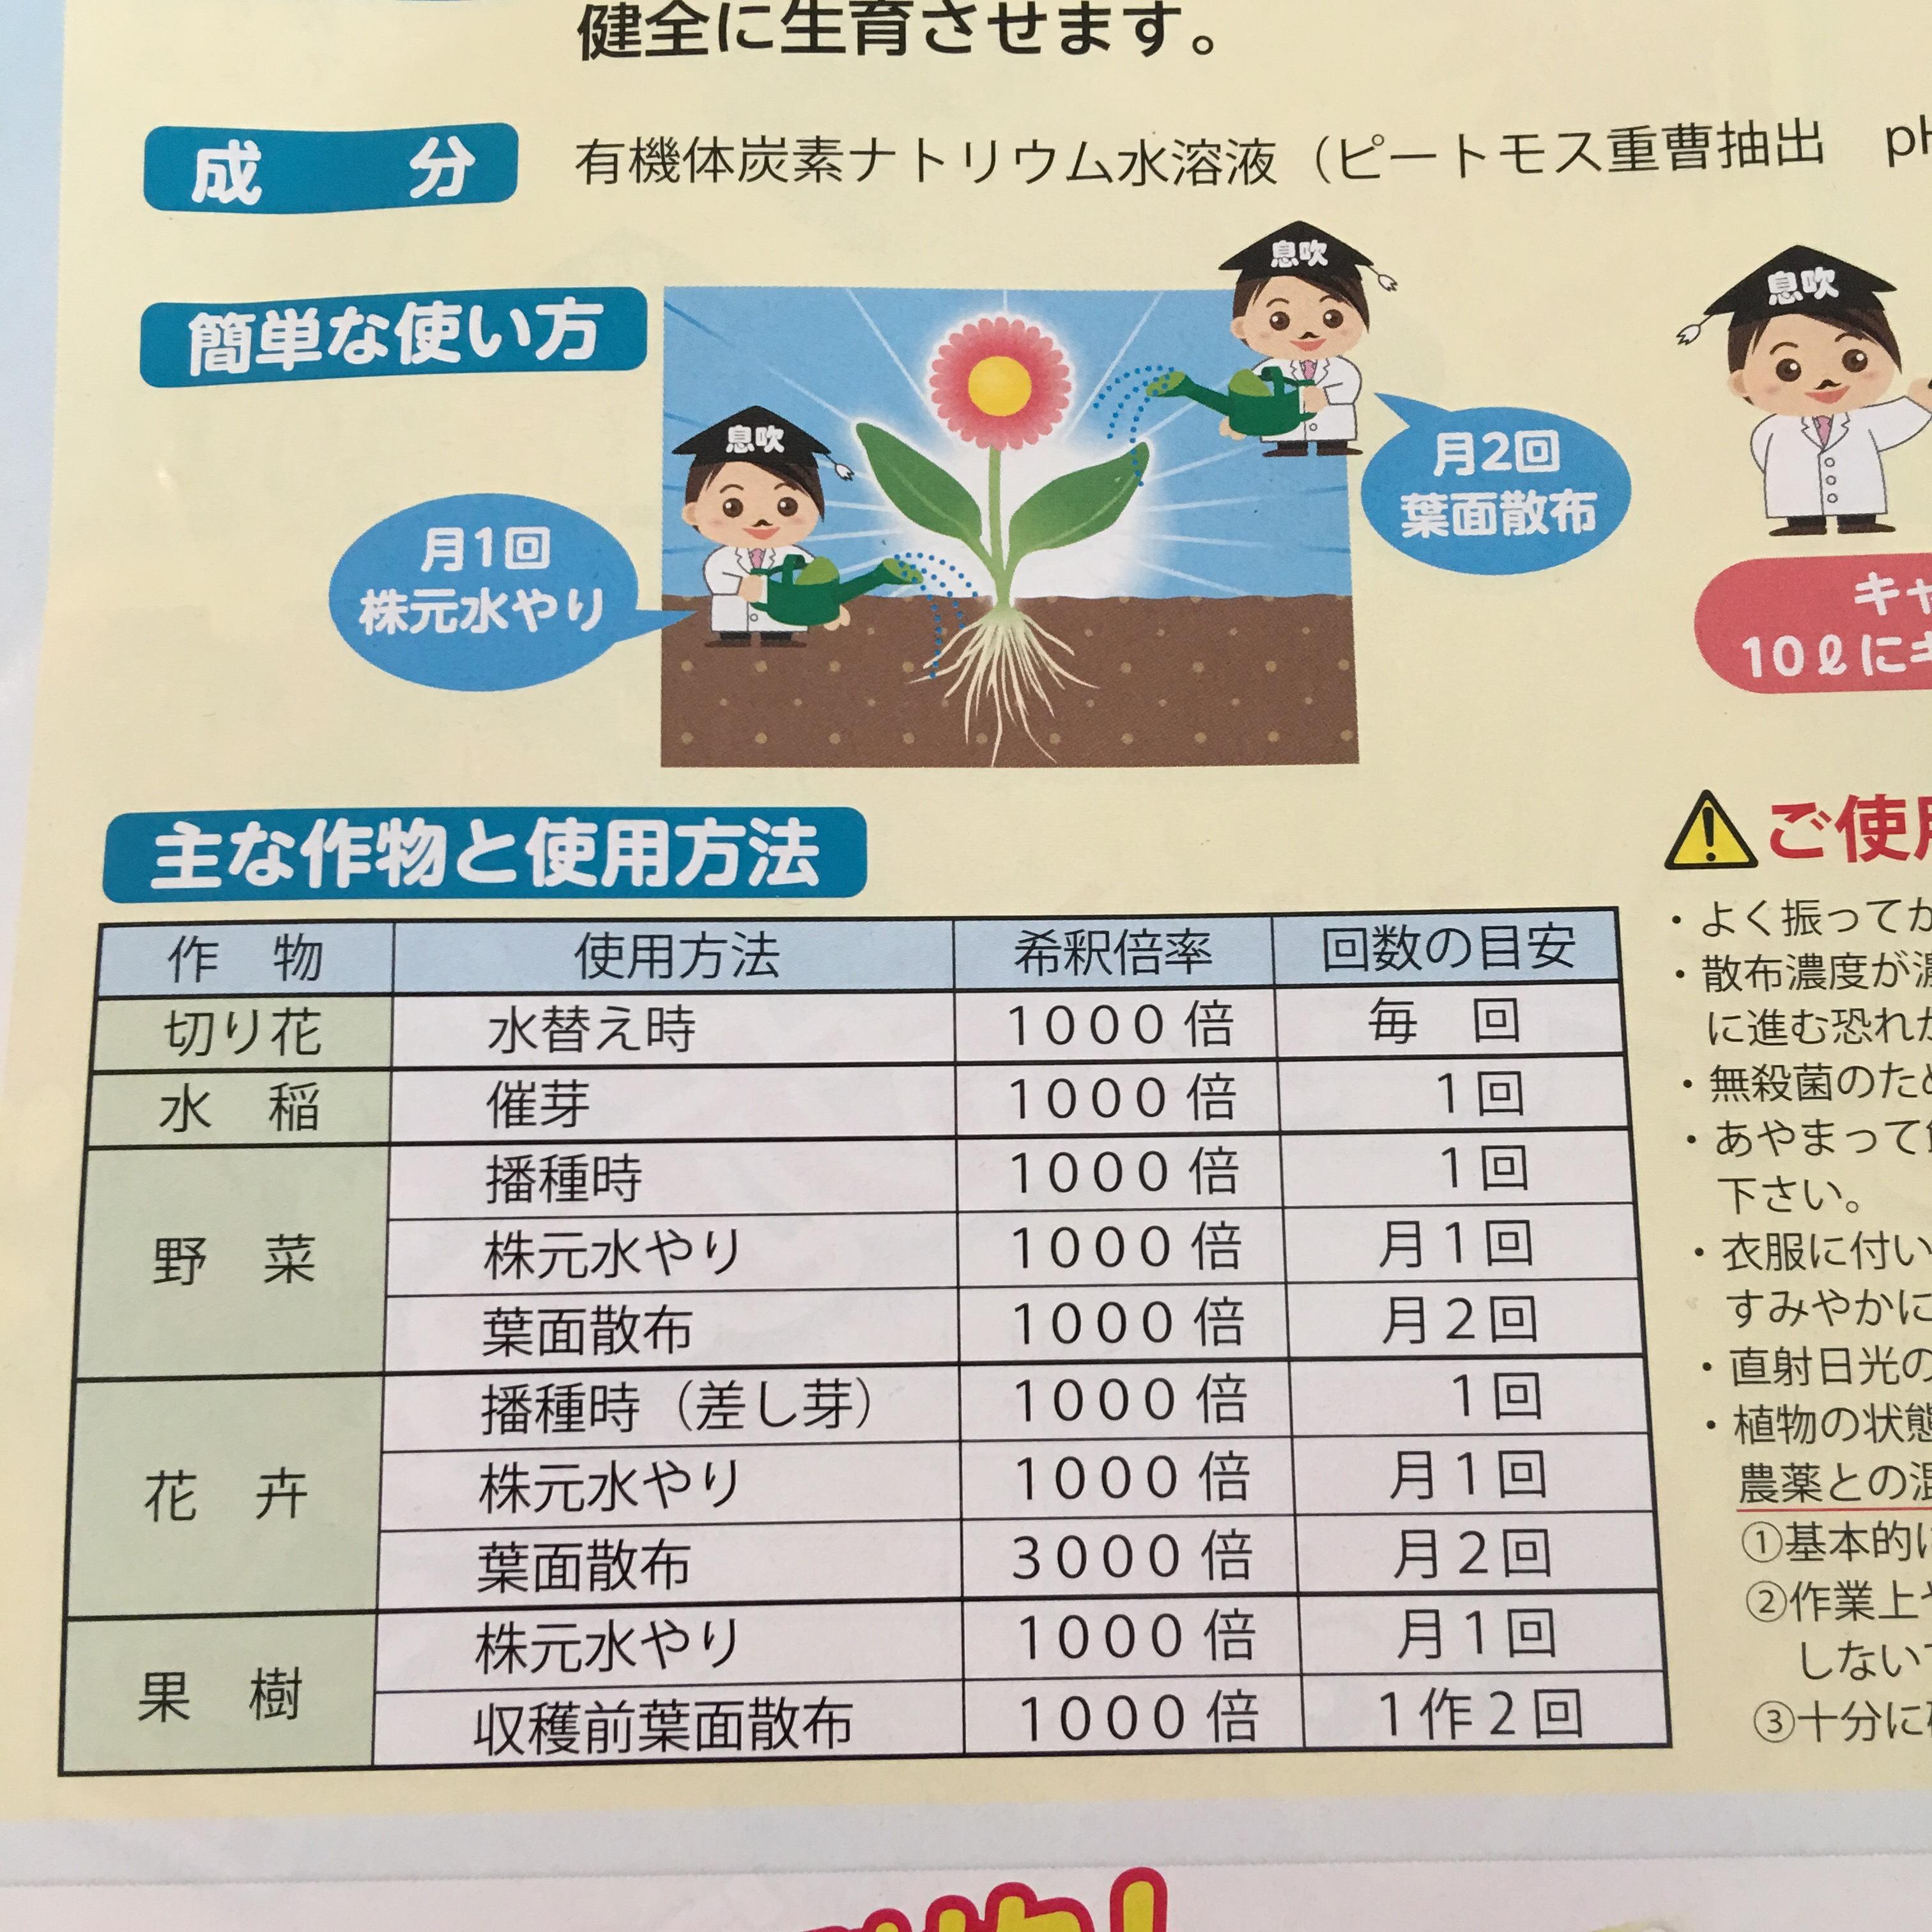 植物活性剤【息吹の雫Q200】200ml - 画像3